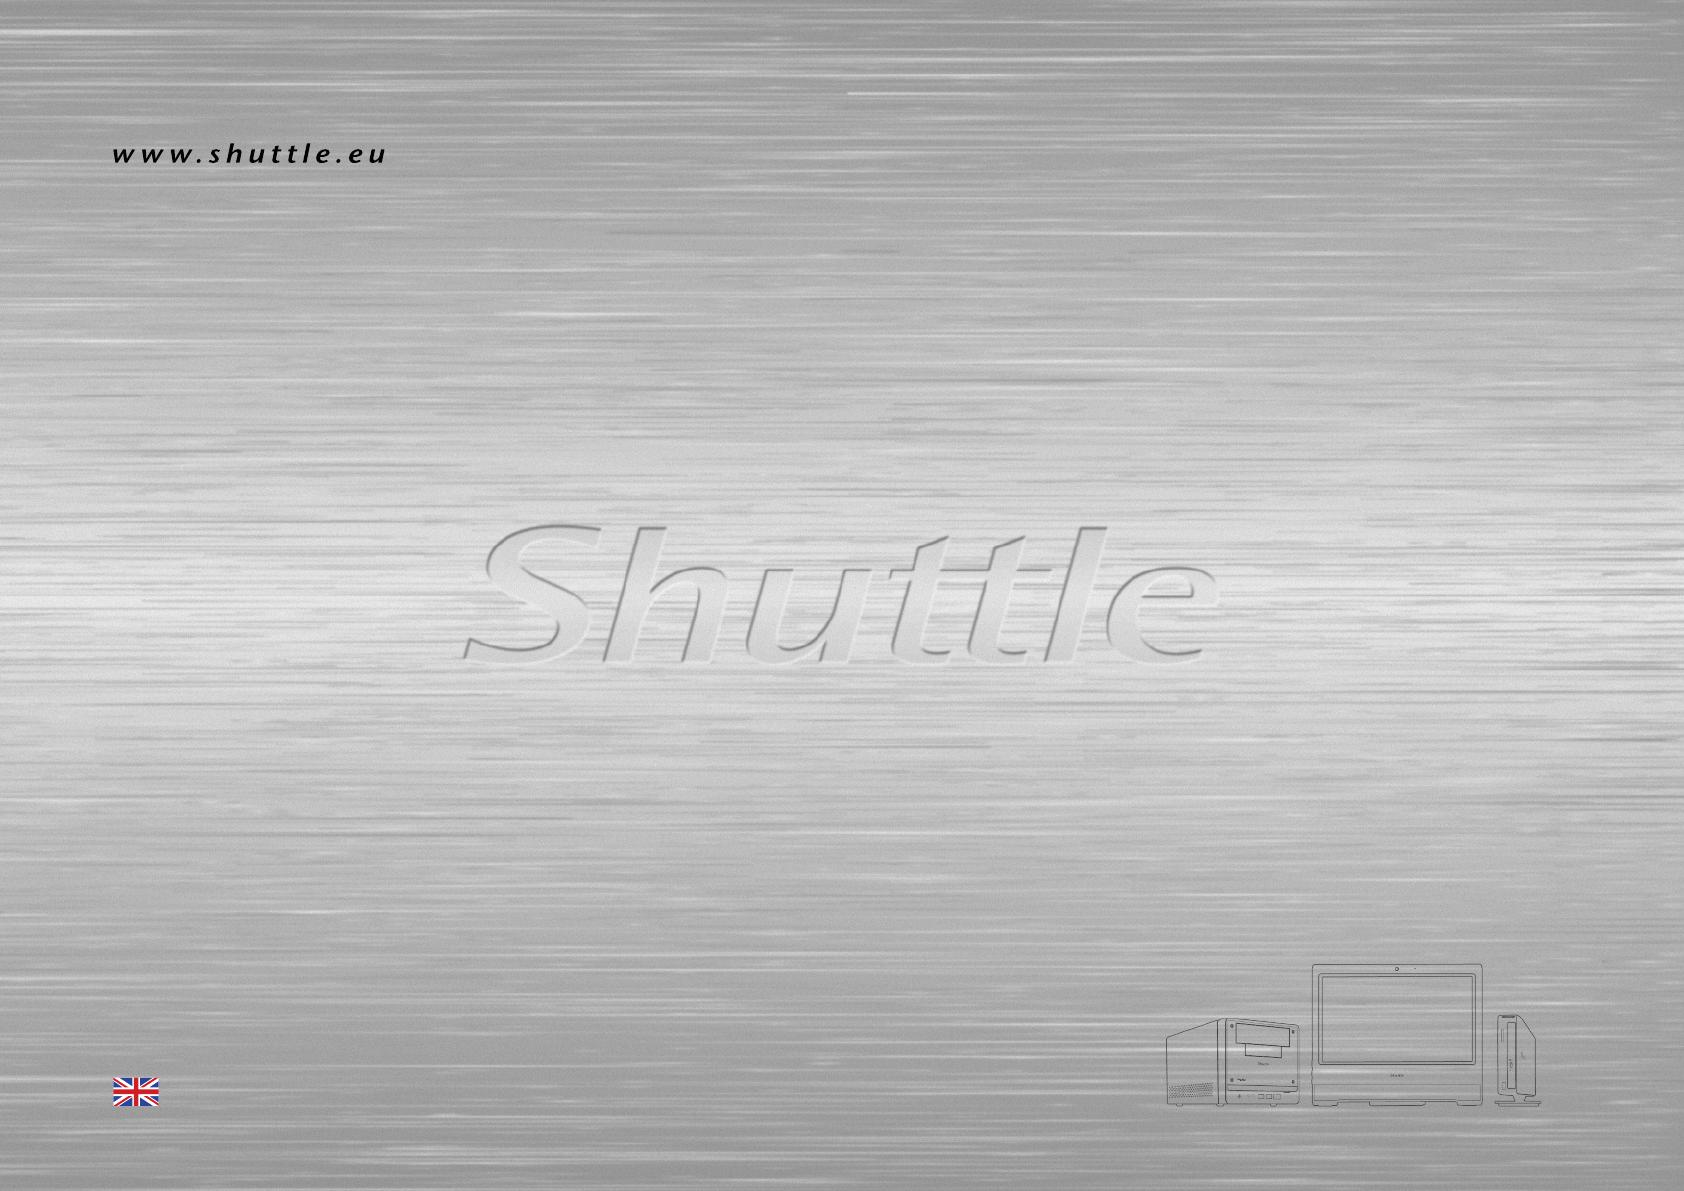 SHUTTLE XS35GS V3 IDT AUDIO 64X